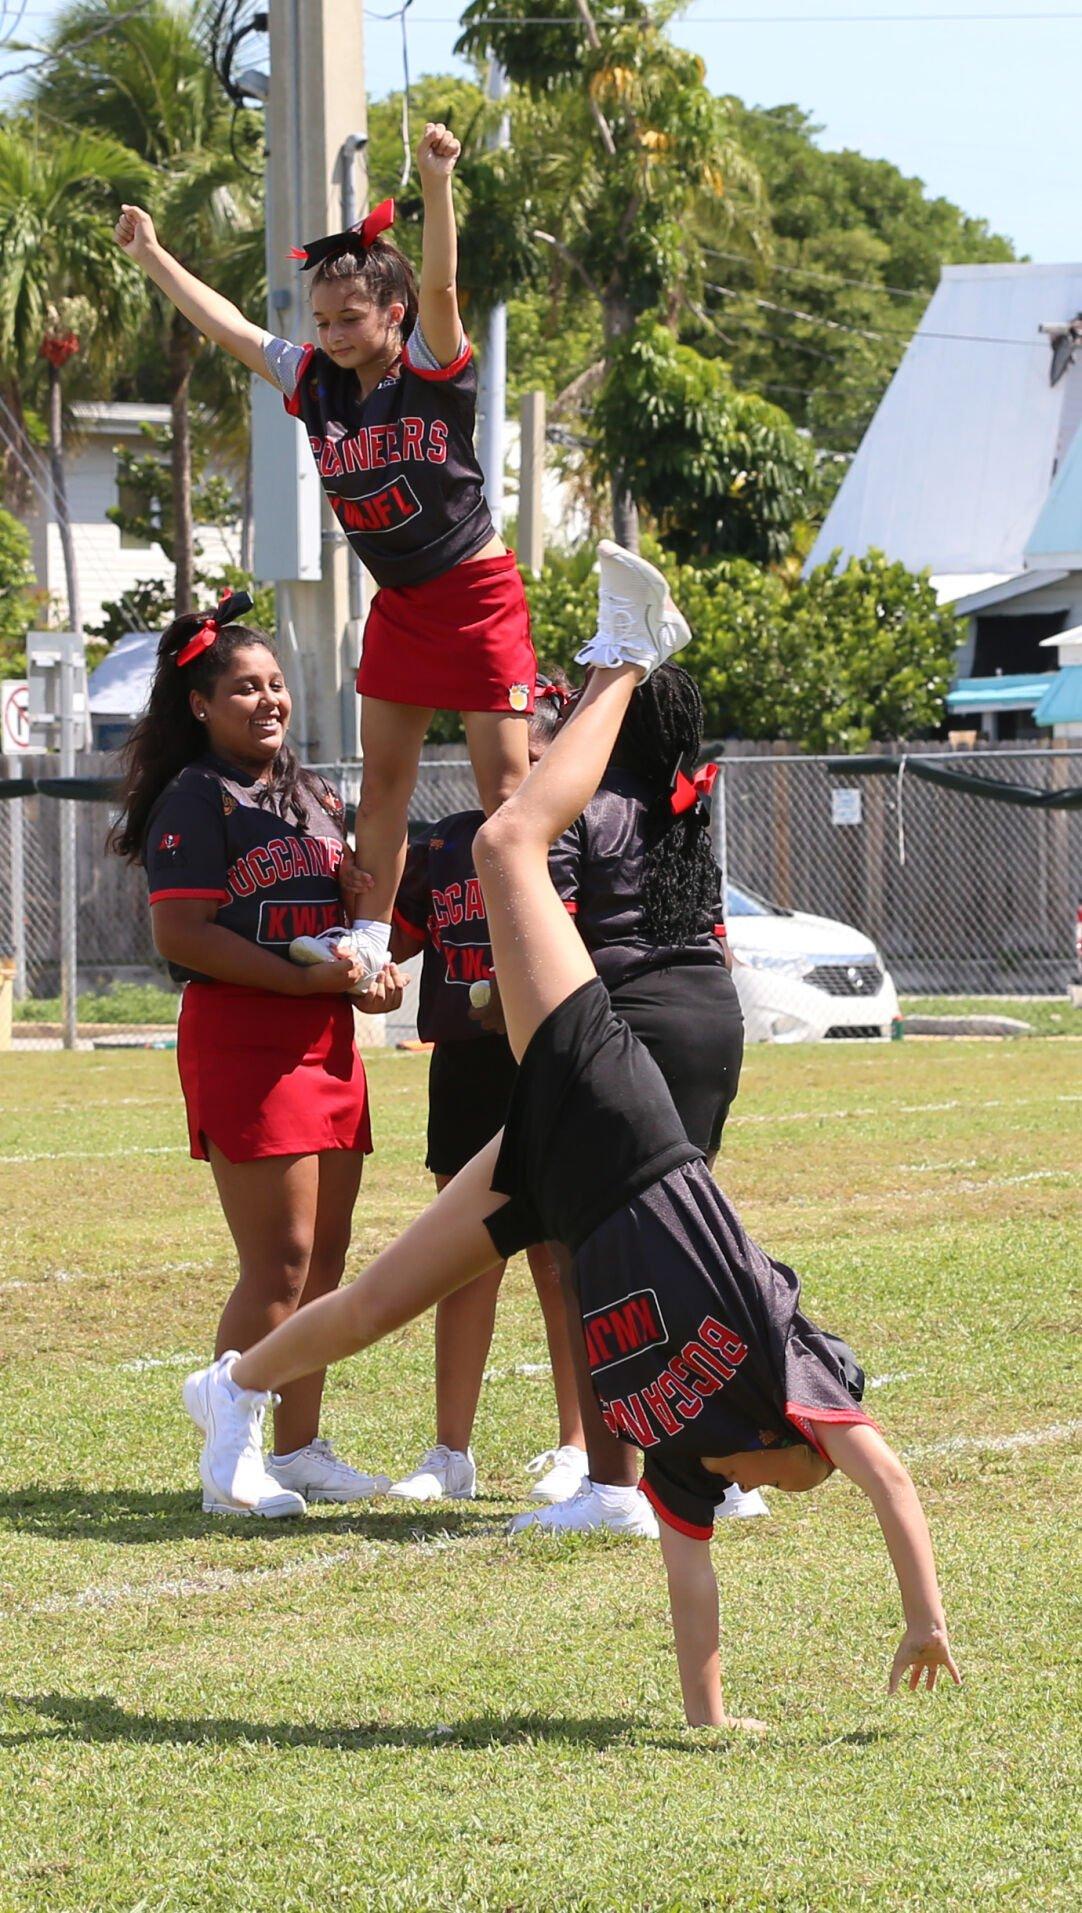 B DIV Bucs cheerleaders halftime acrobatics.JPG